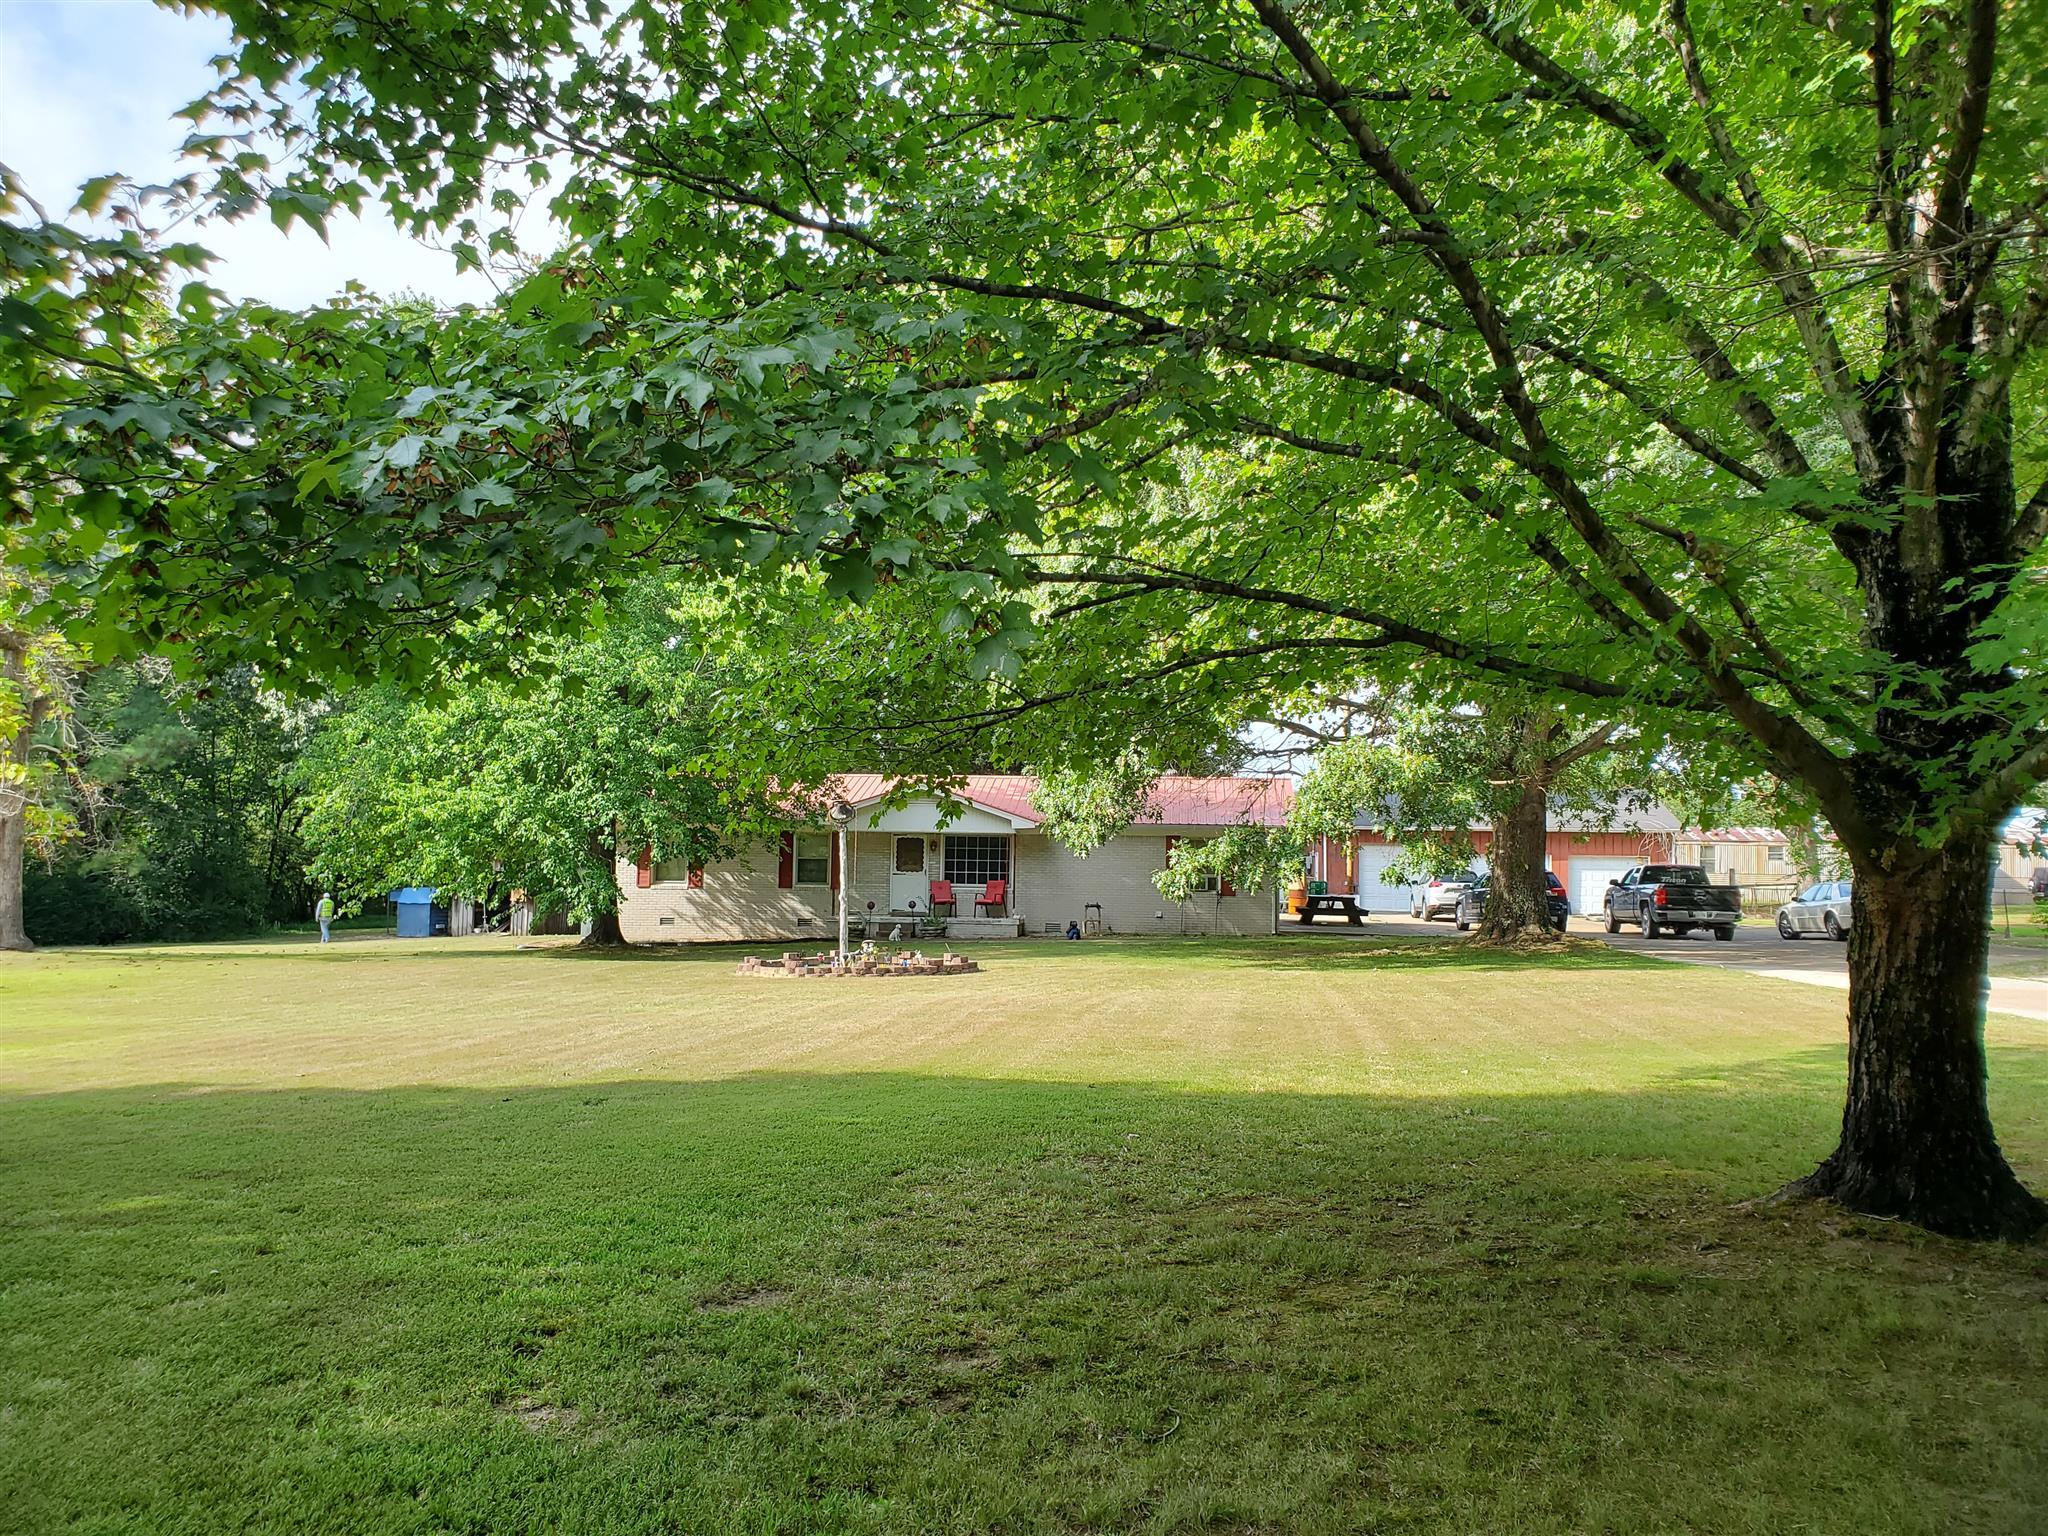 1795 Hickman Rd, New Johnsonville, TN 37134 - New Johnsonville, TN real estate listing